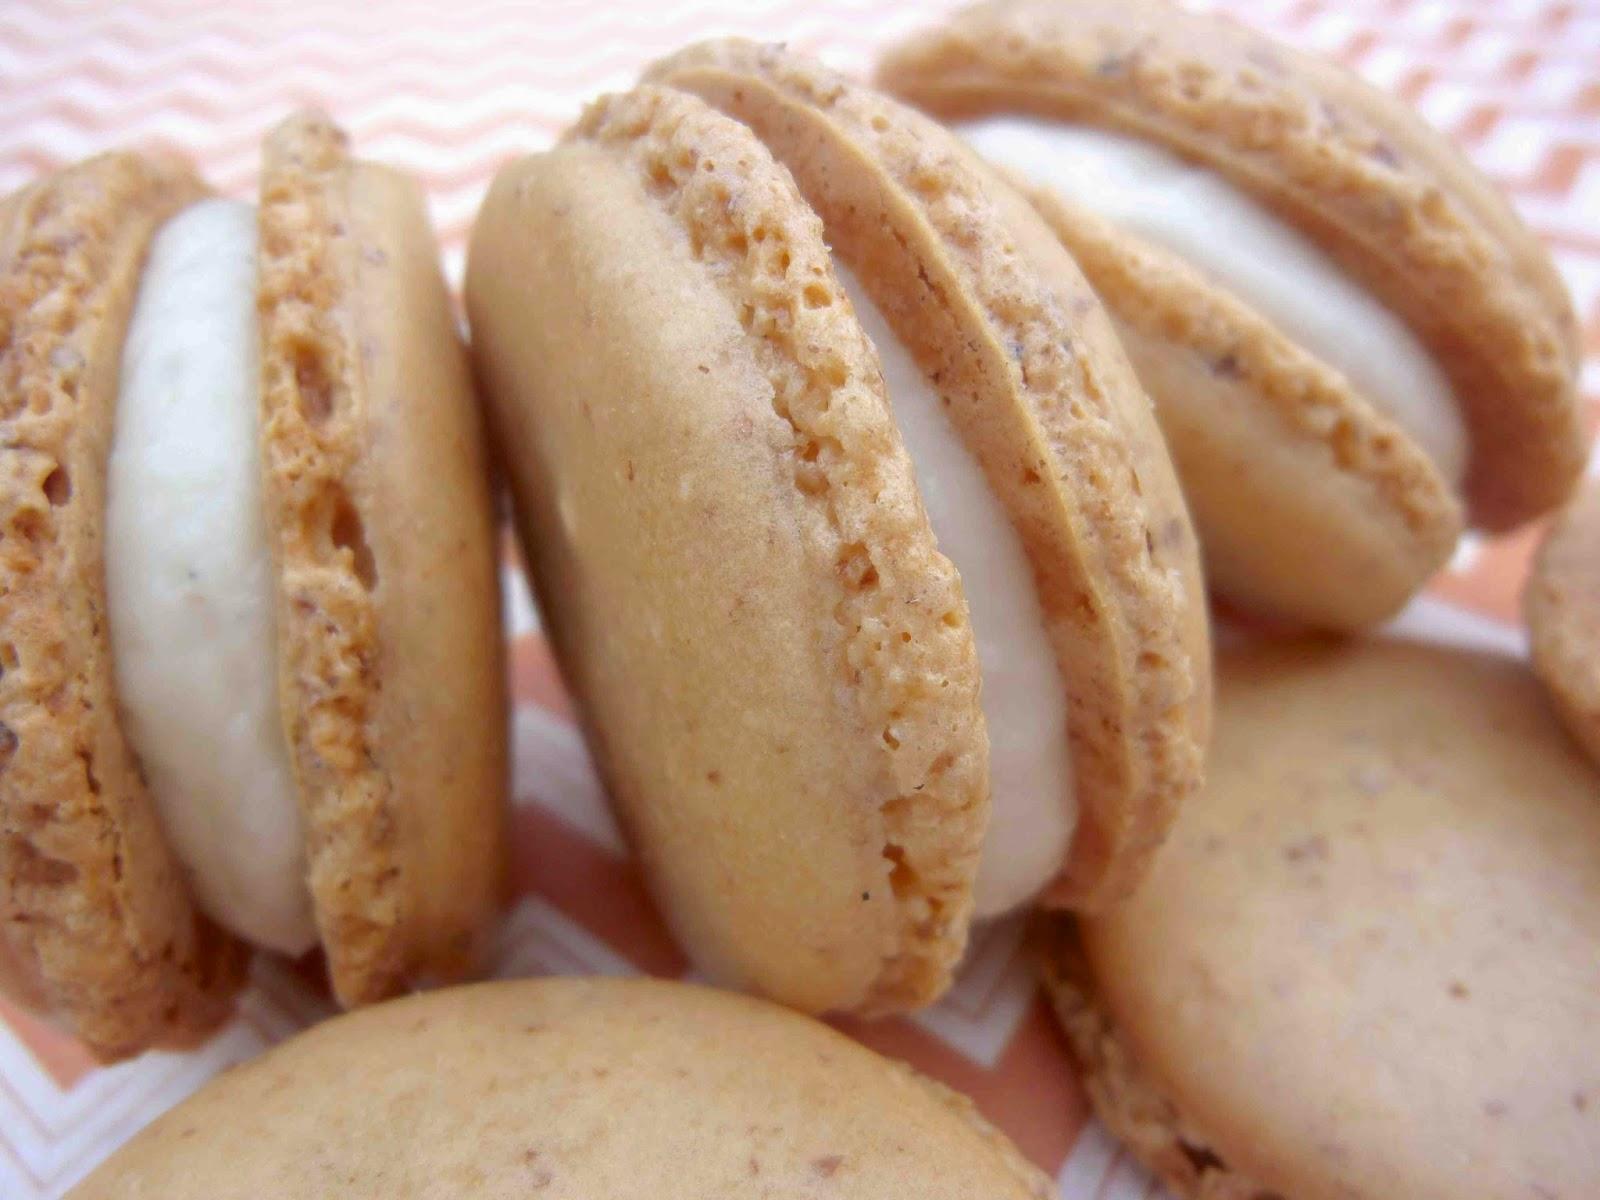 ... Hausfrau: Butterscotch French Macarons with Vanilla Bean Buttercream